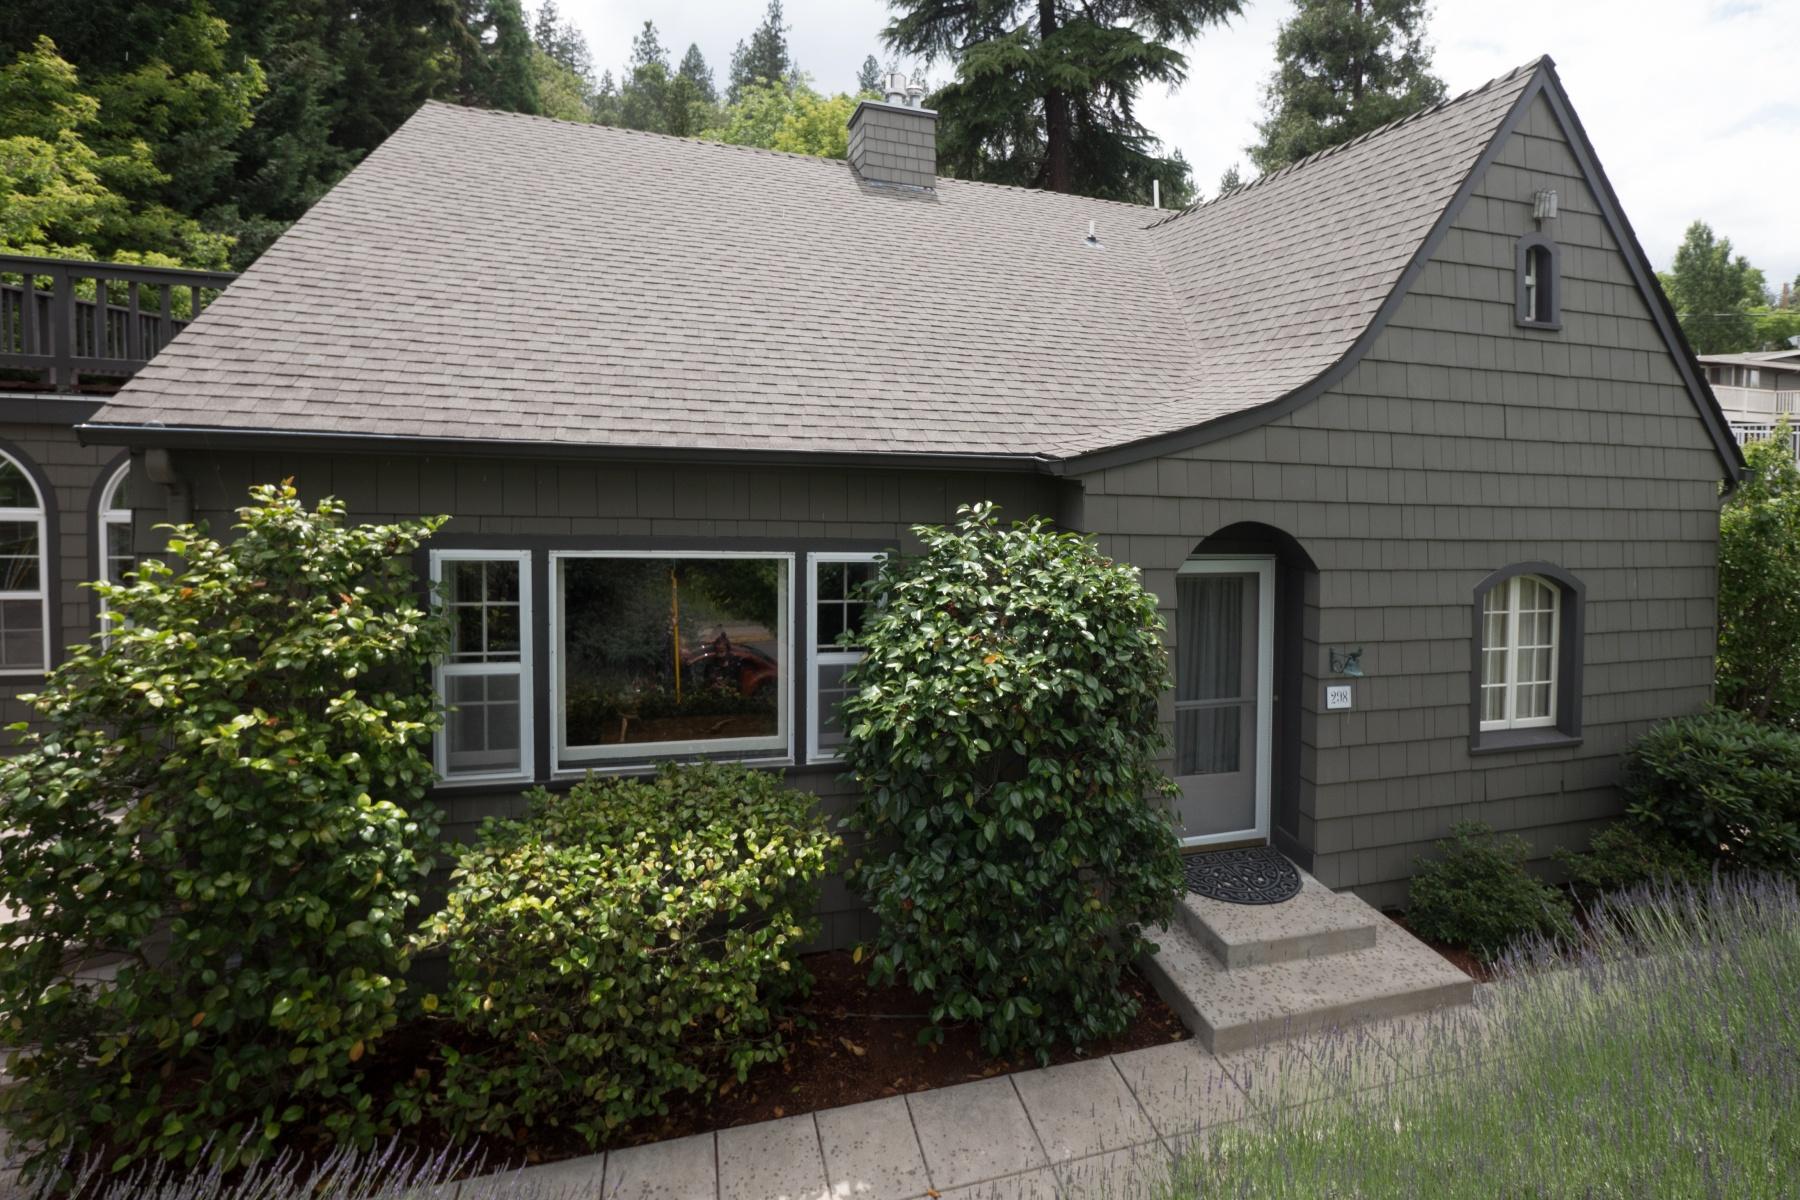 Single Family Home for Sale at Ashland Classic 298 Hargadine St Ashland, Oregon, 97520 United States